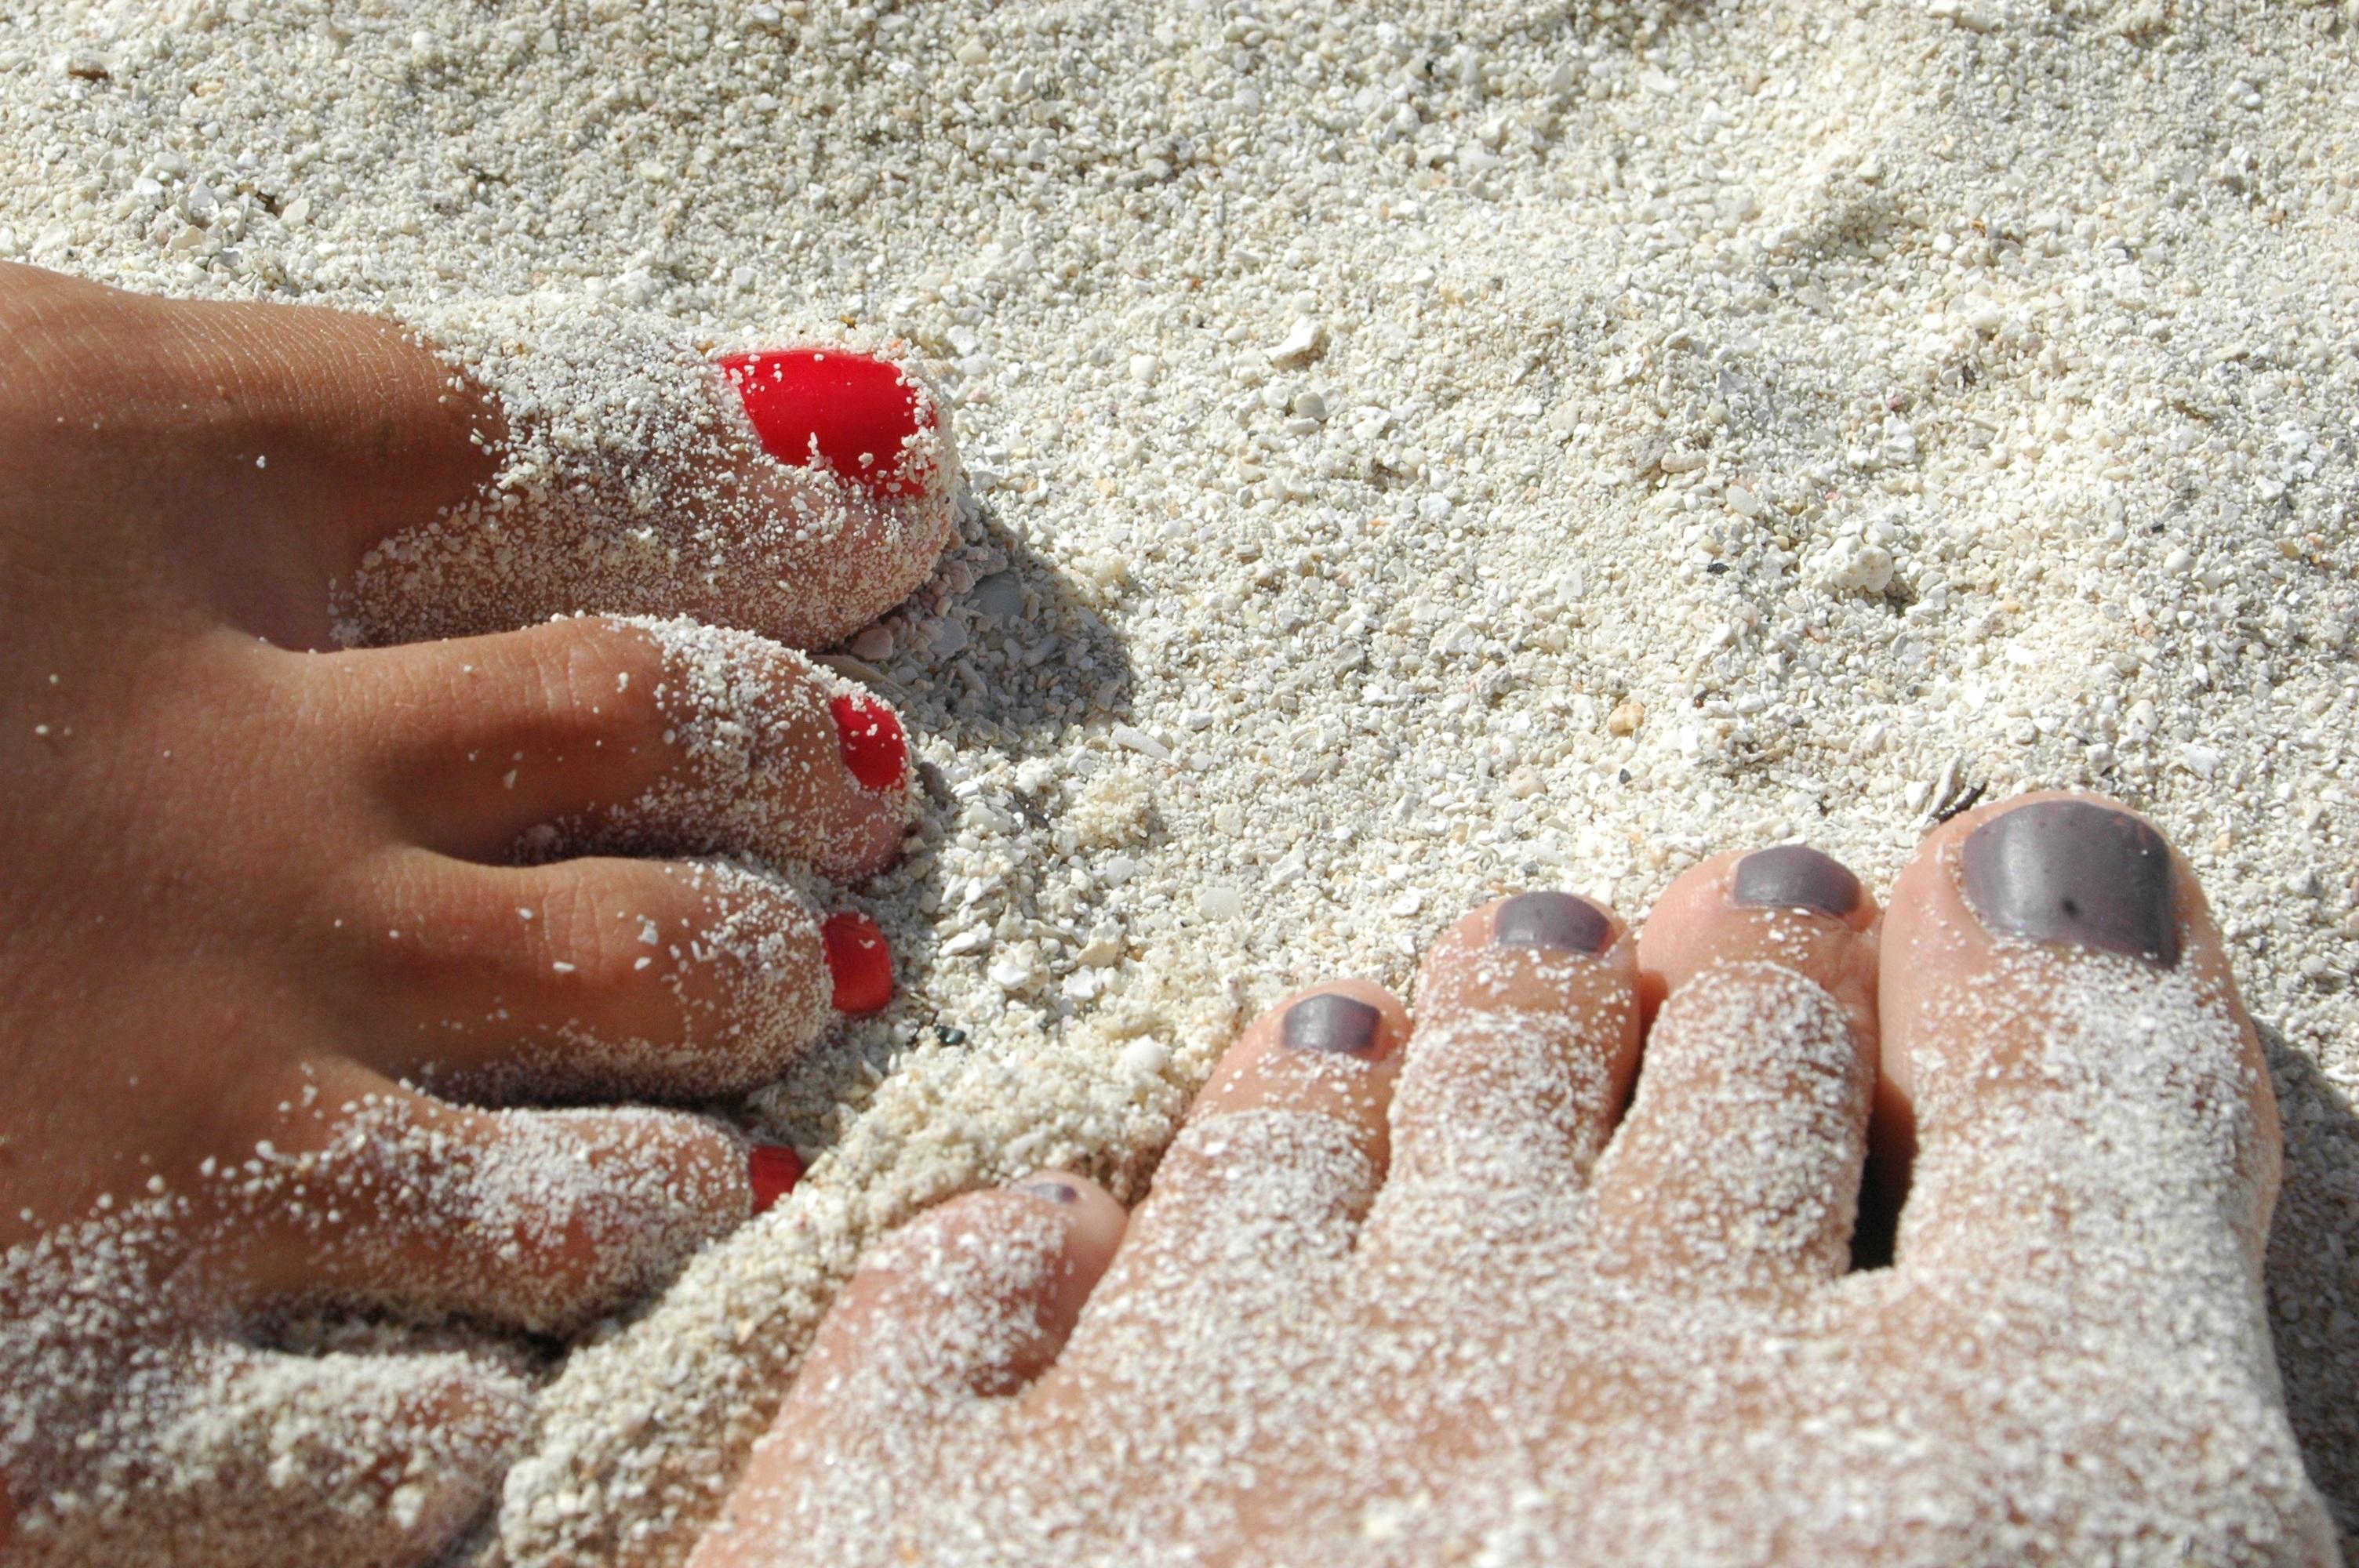 Free Images : hand, beach, feet, leg, finger, holiday, soil, human ...